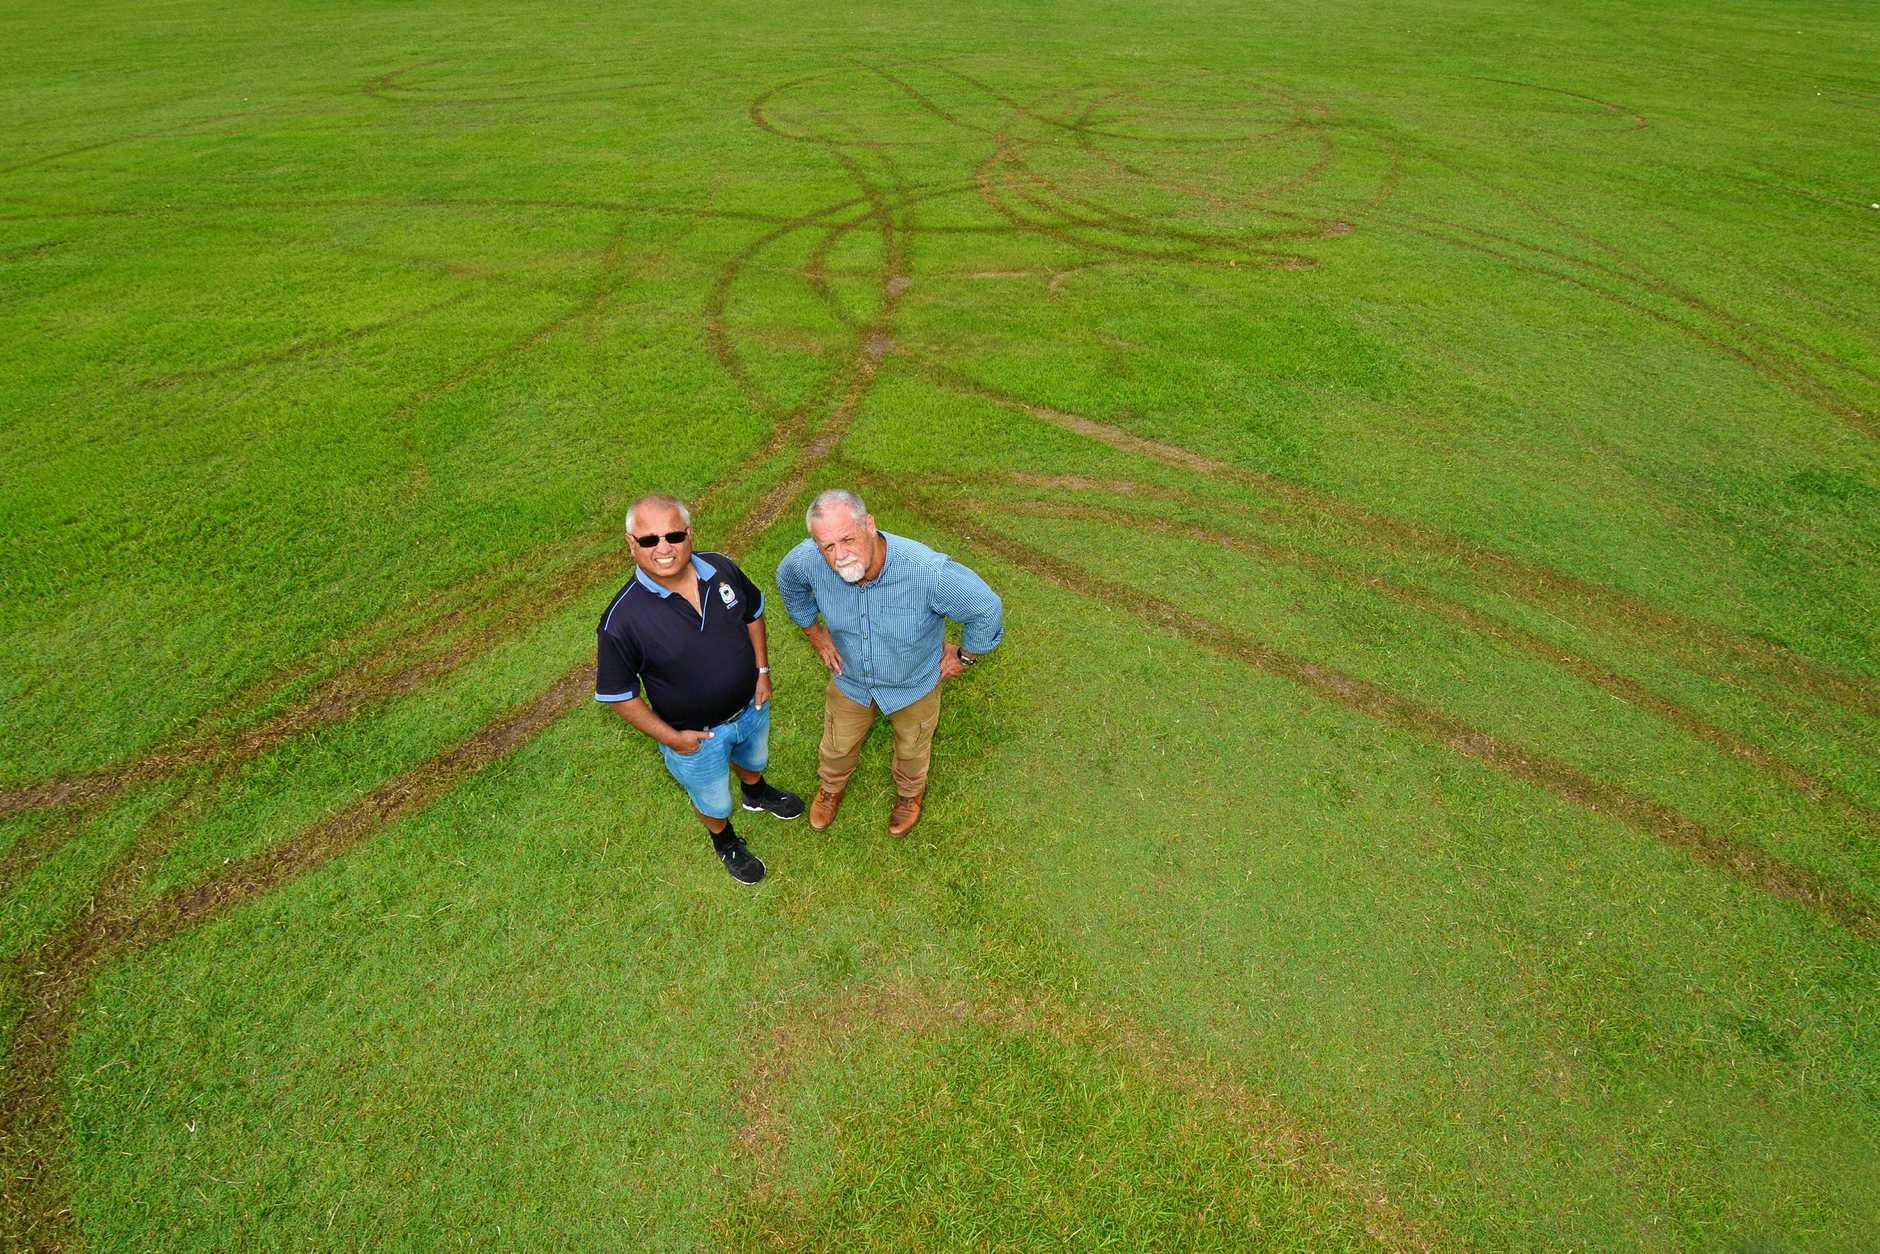 DUMB YOBBOS: Sunshine Coast Hockey Association in Buderim has had one of their hocjkey fields vandalised. Secretary Grendell Antony and Bruce Potts are not impressed.